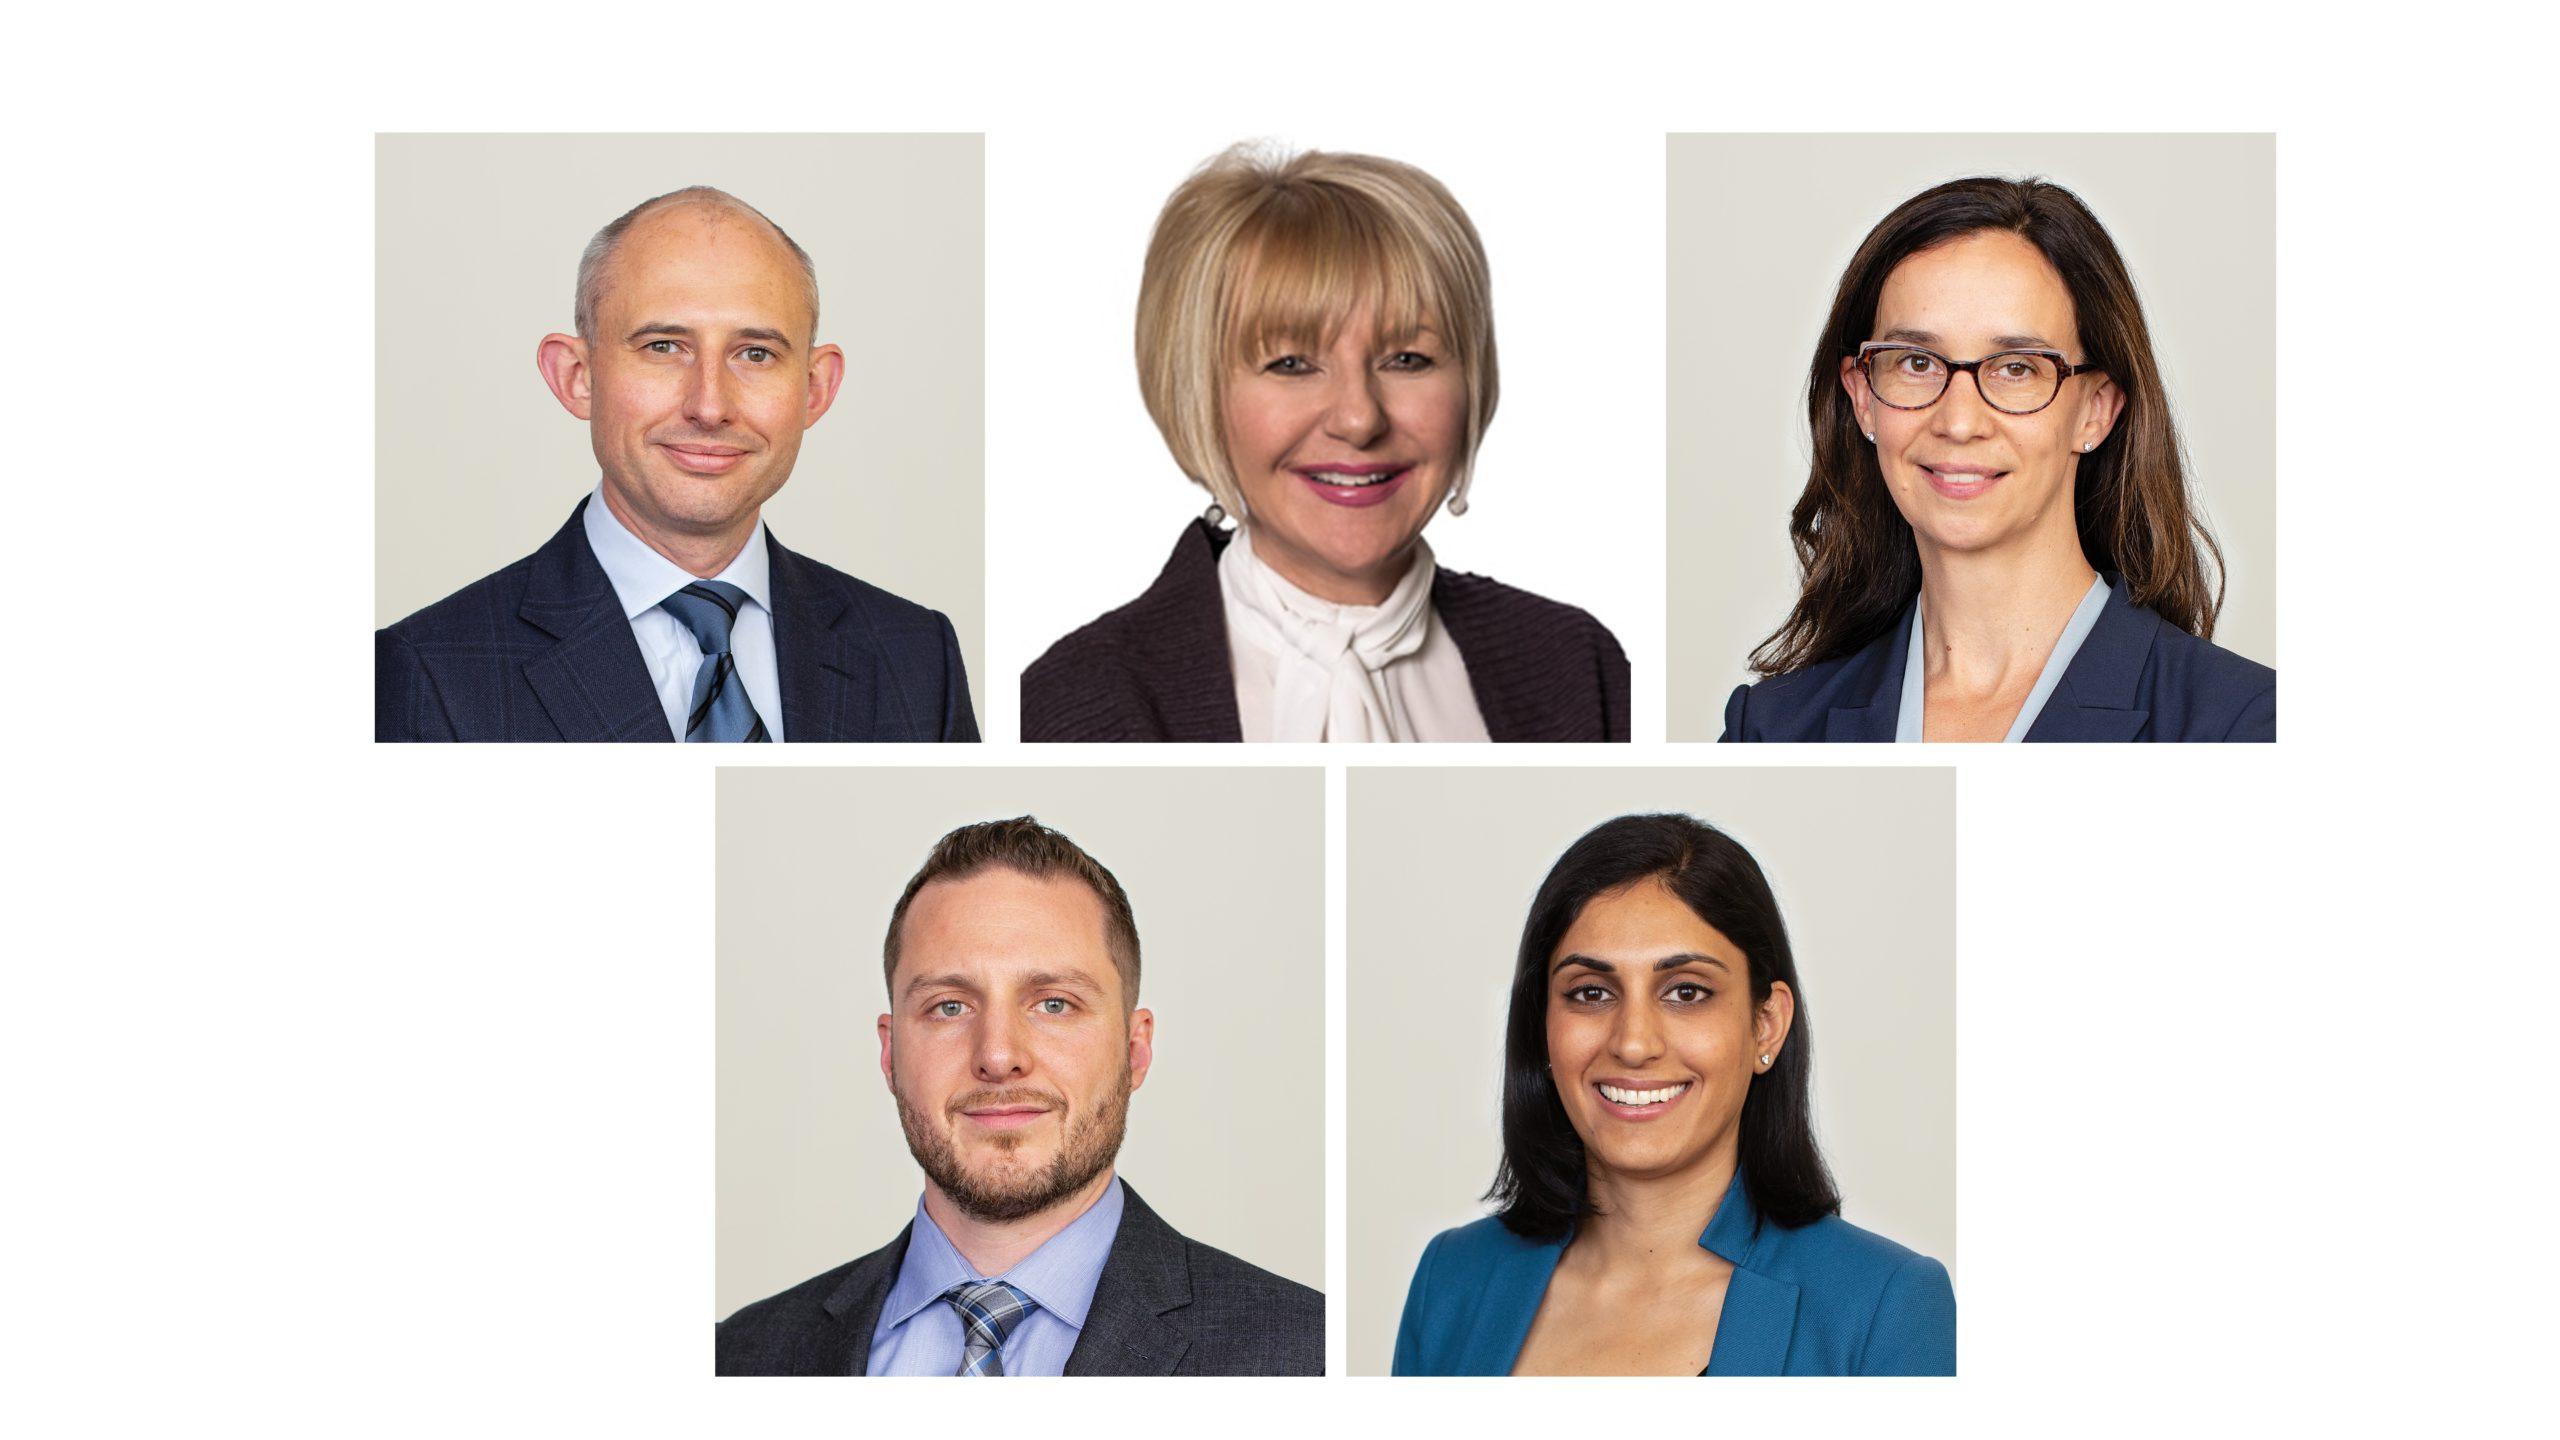 Ryan Wiley, PhD, Deborah Gordon-El-Bihbety, BA, Anne Mullin, PhD, MBA, Don Walkinshaw and PhD, Natasha Malik, PhD